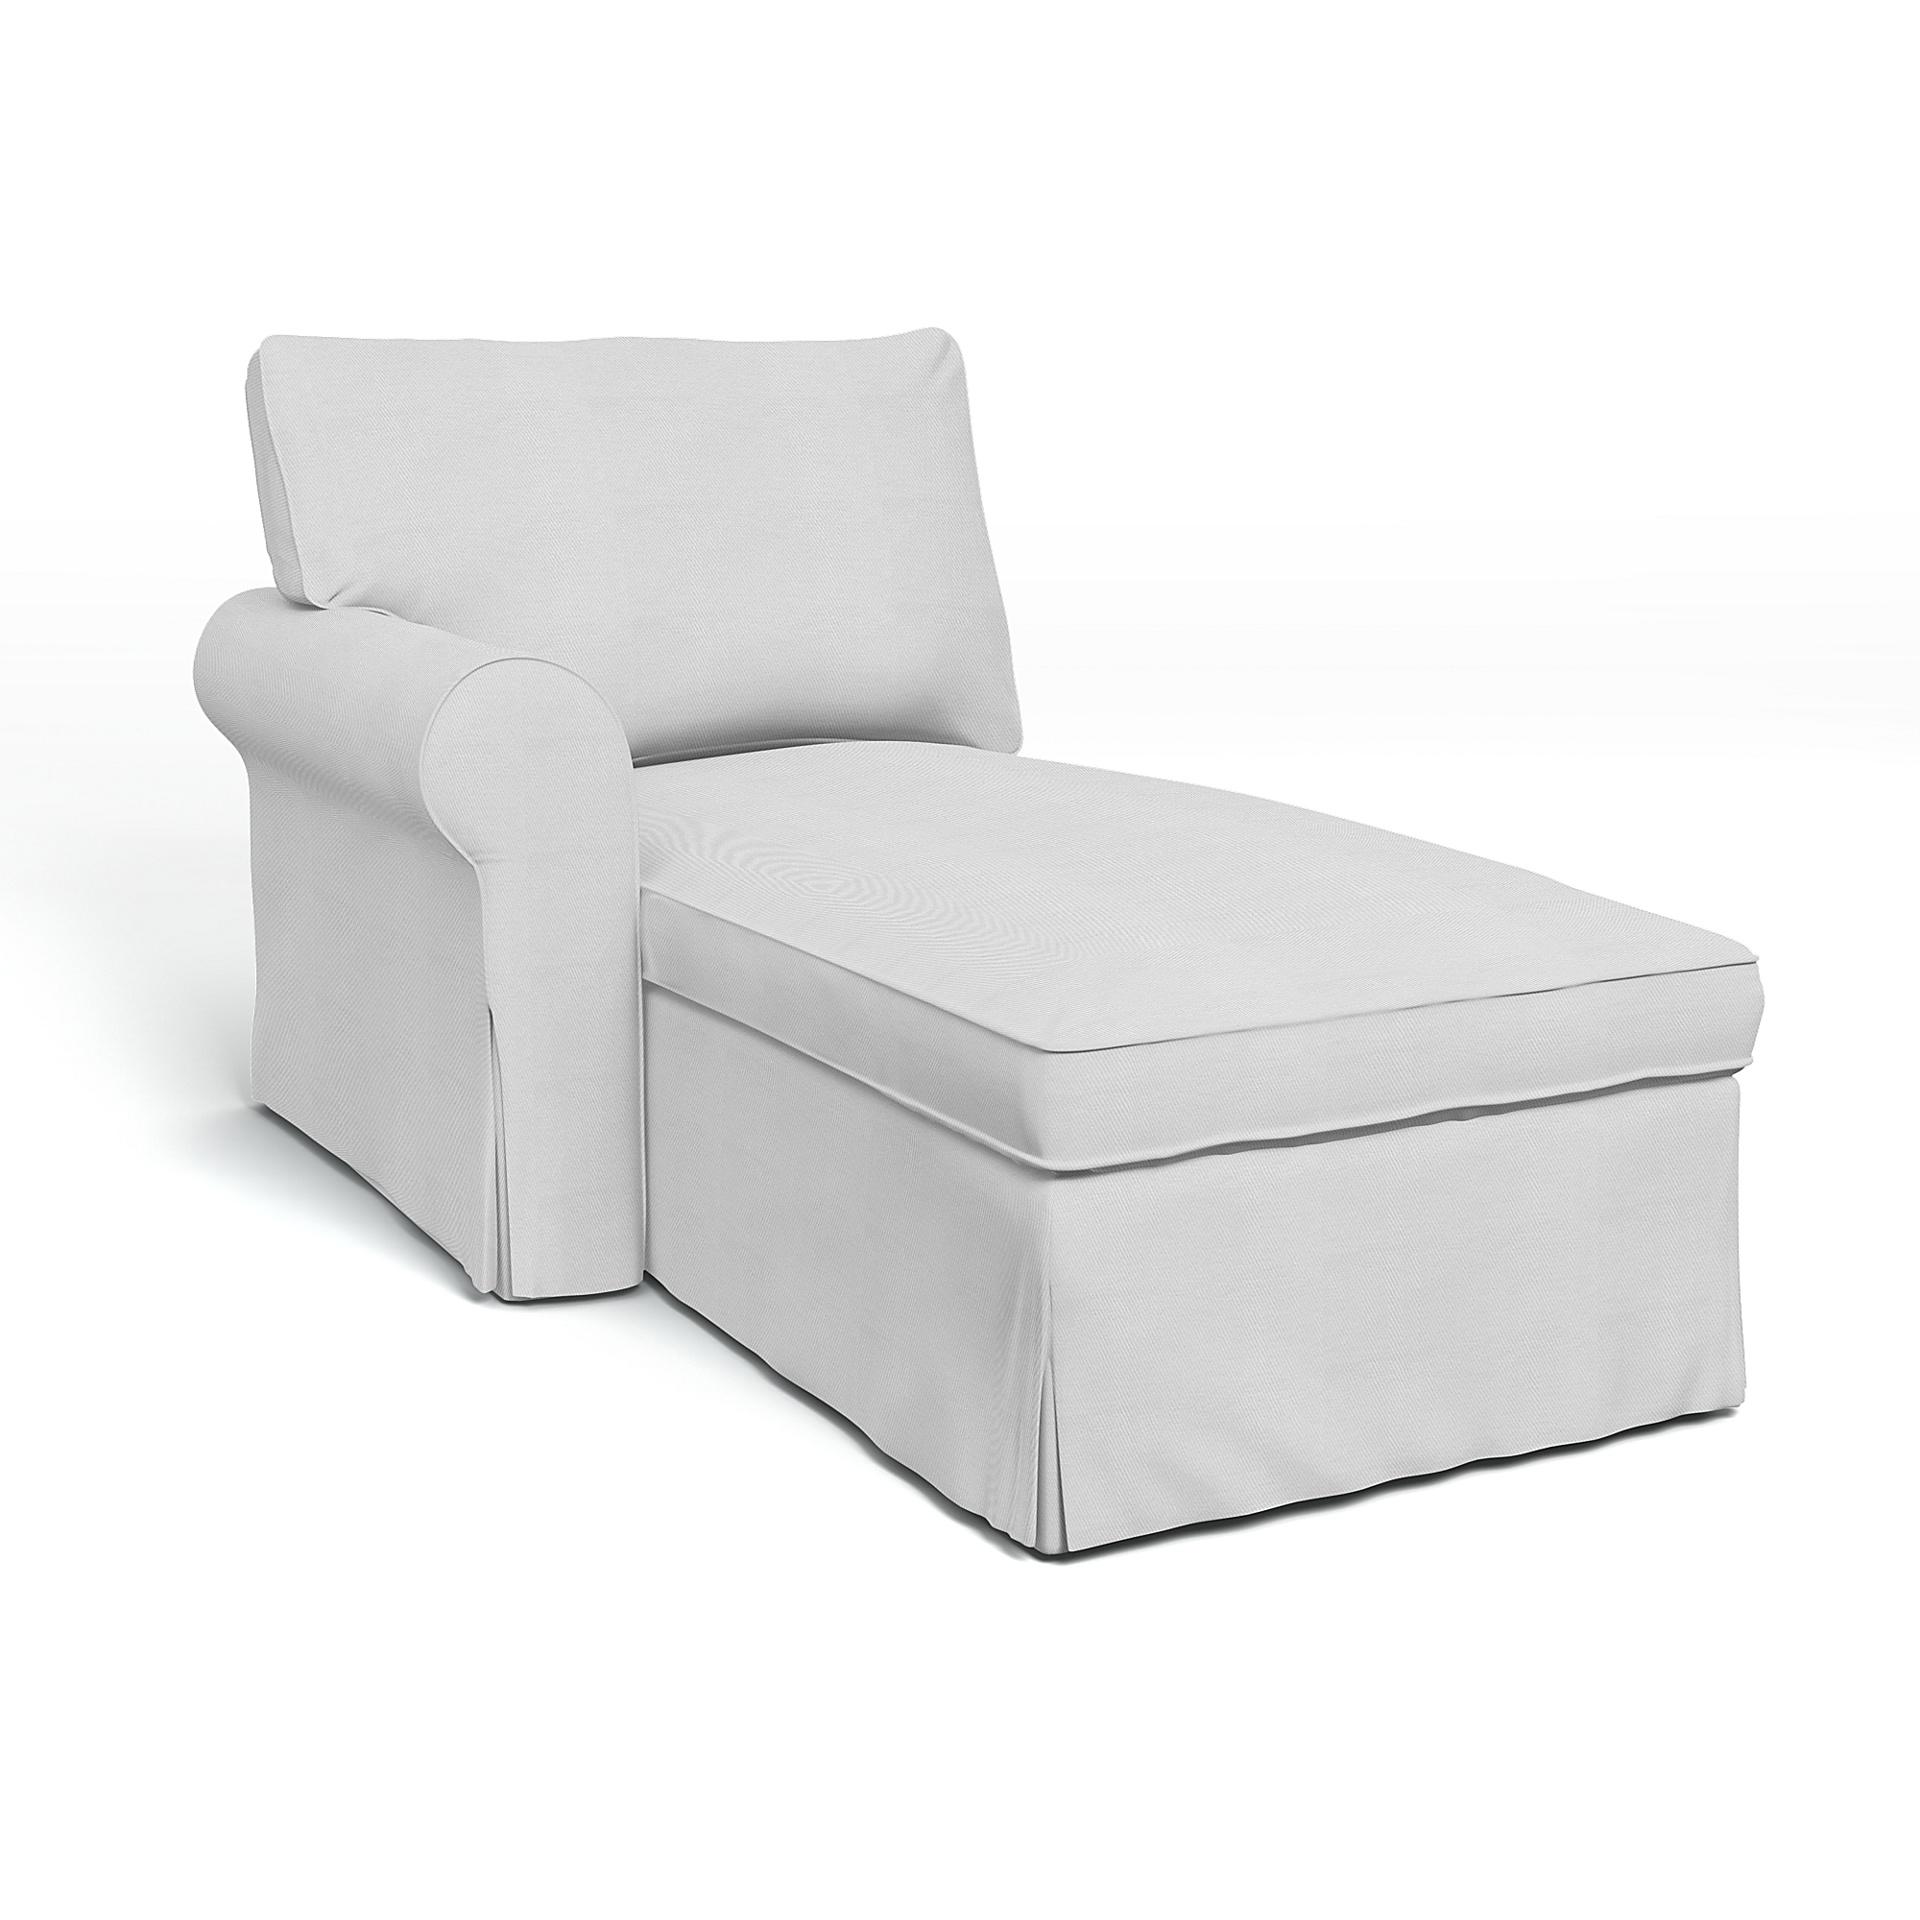 Ikea Ektorp Hoes Chaise Longue Met Biezen Links Bemz Bemz